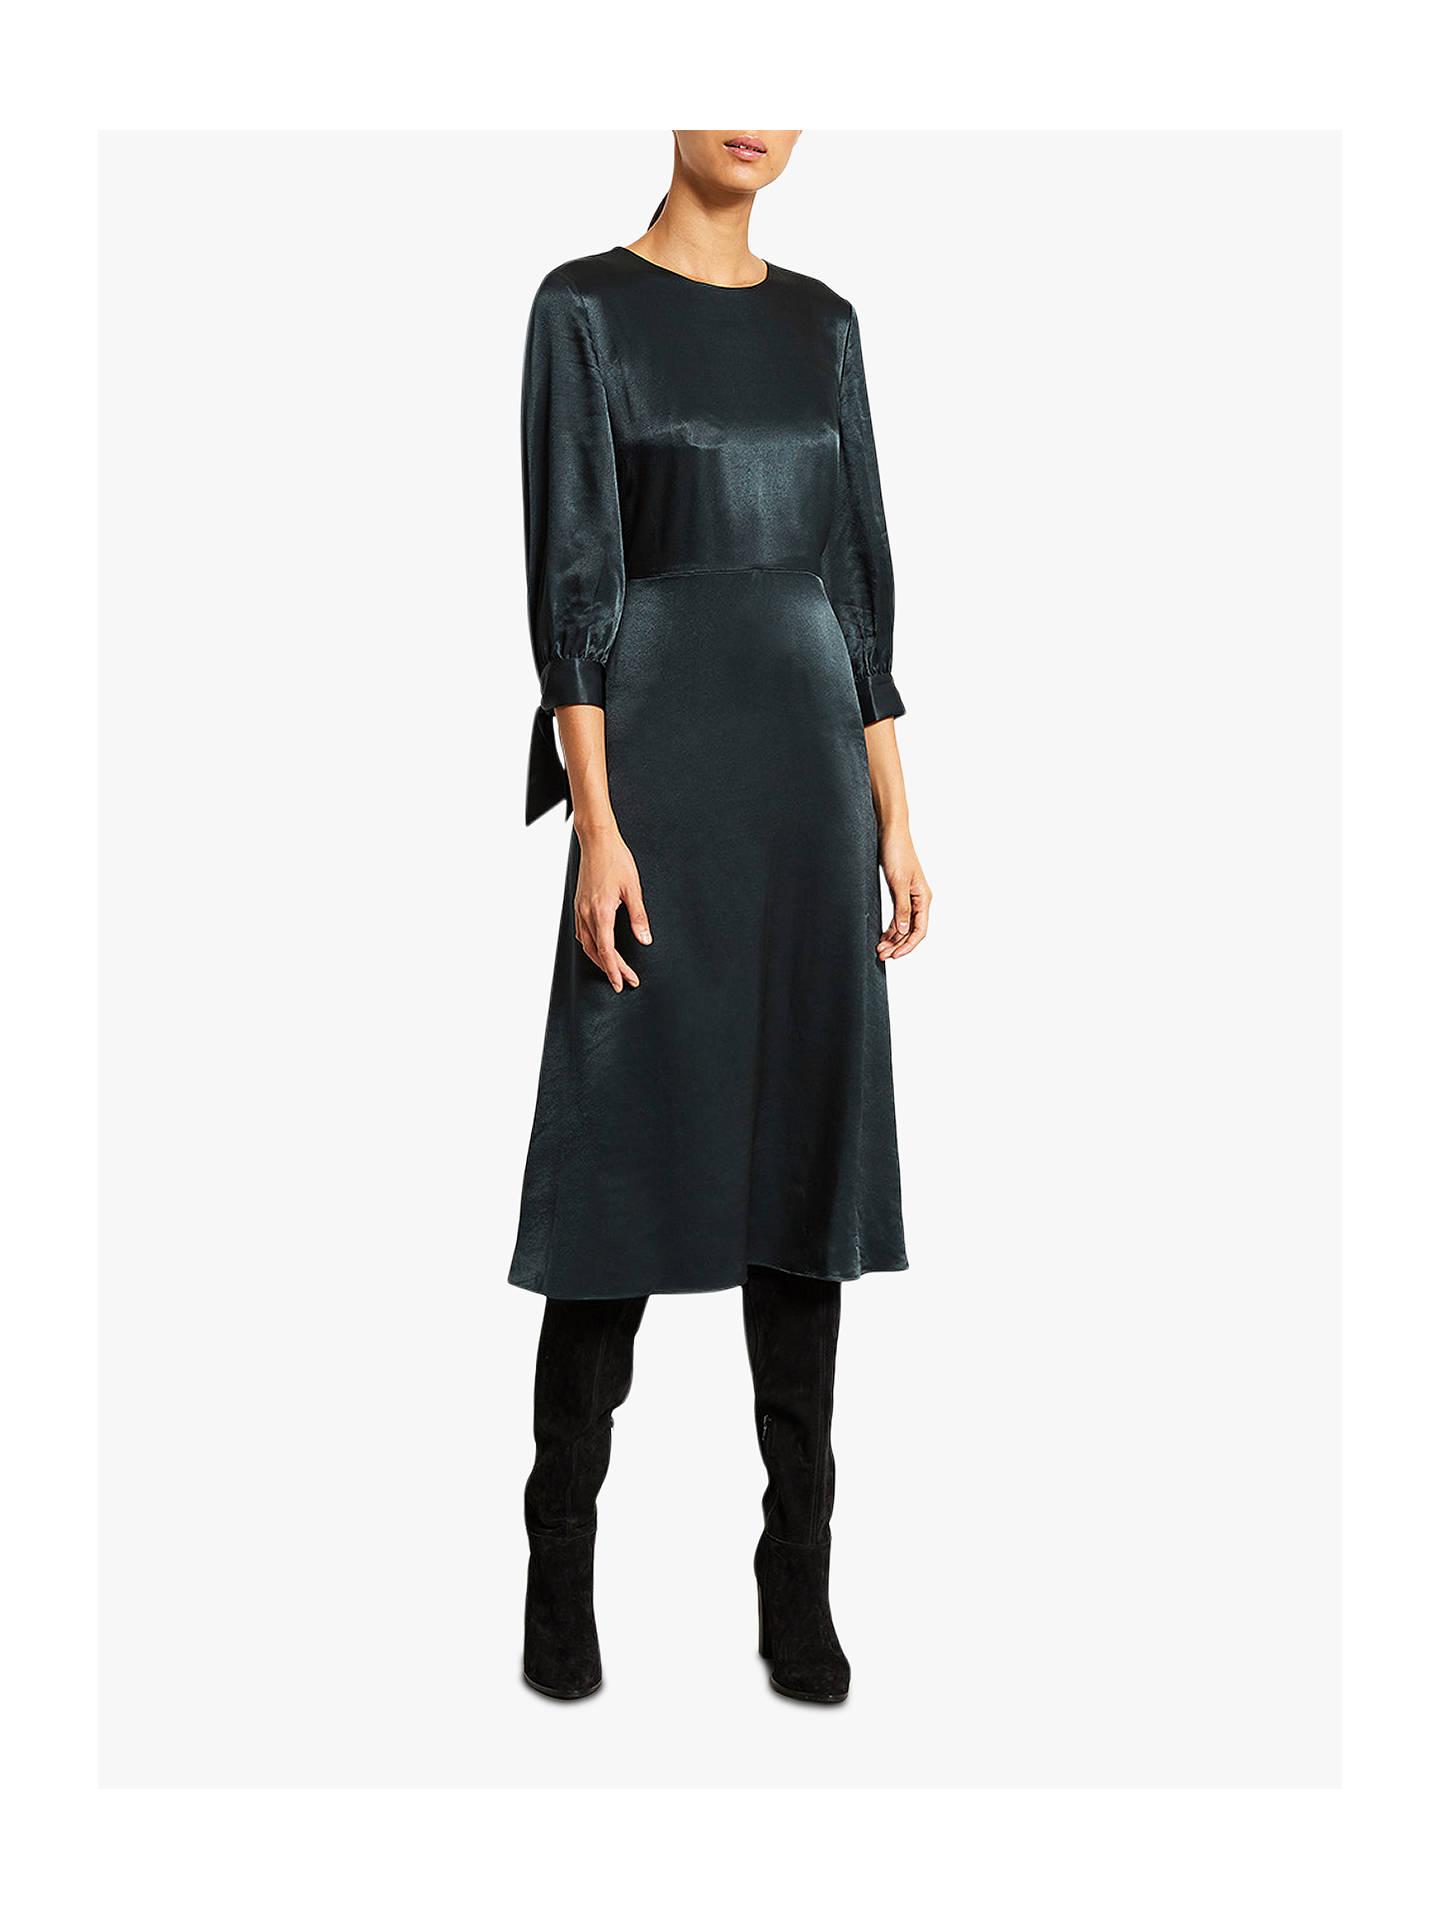 buy sale coupon codes new concept Mint Velvet Satin Midi Dress, Bottle Green at John Lewis & Partners